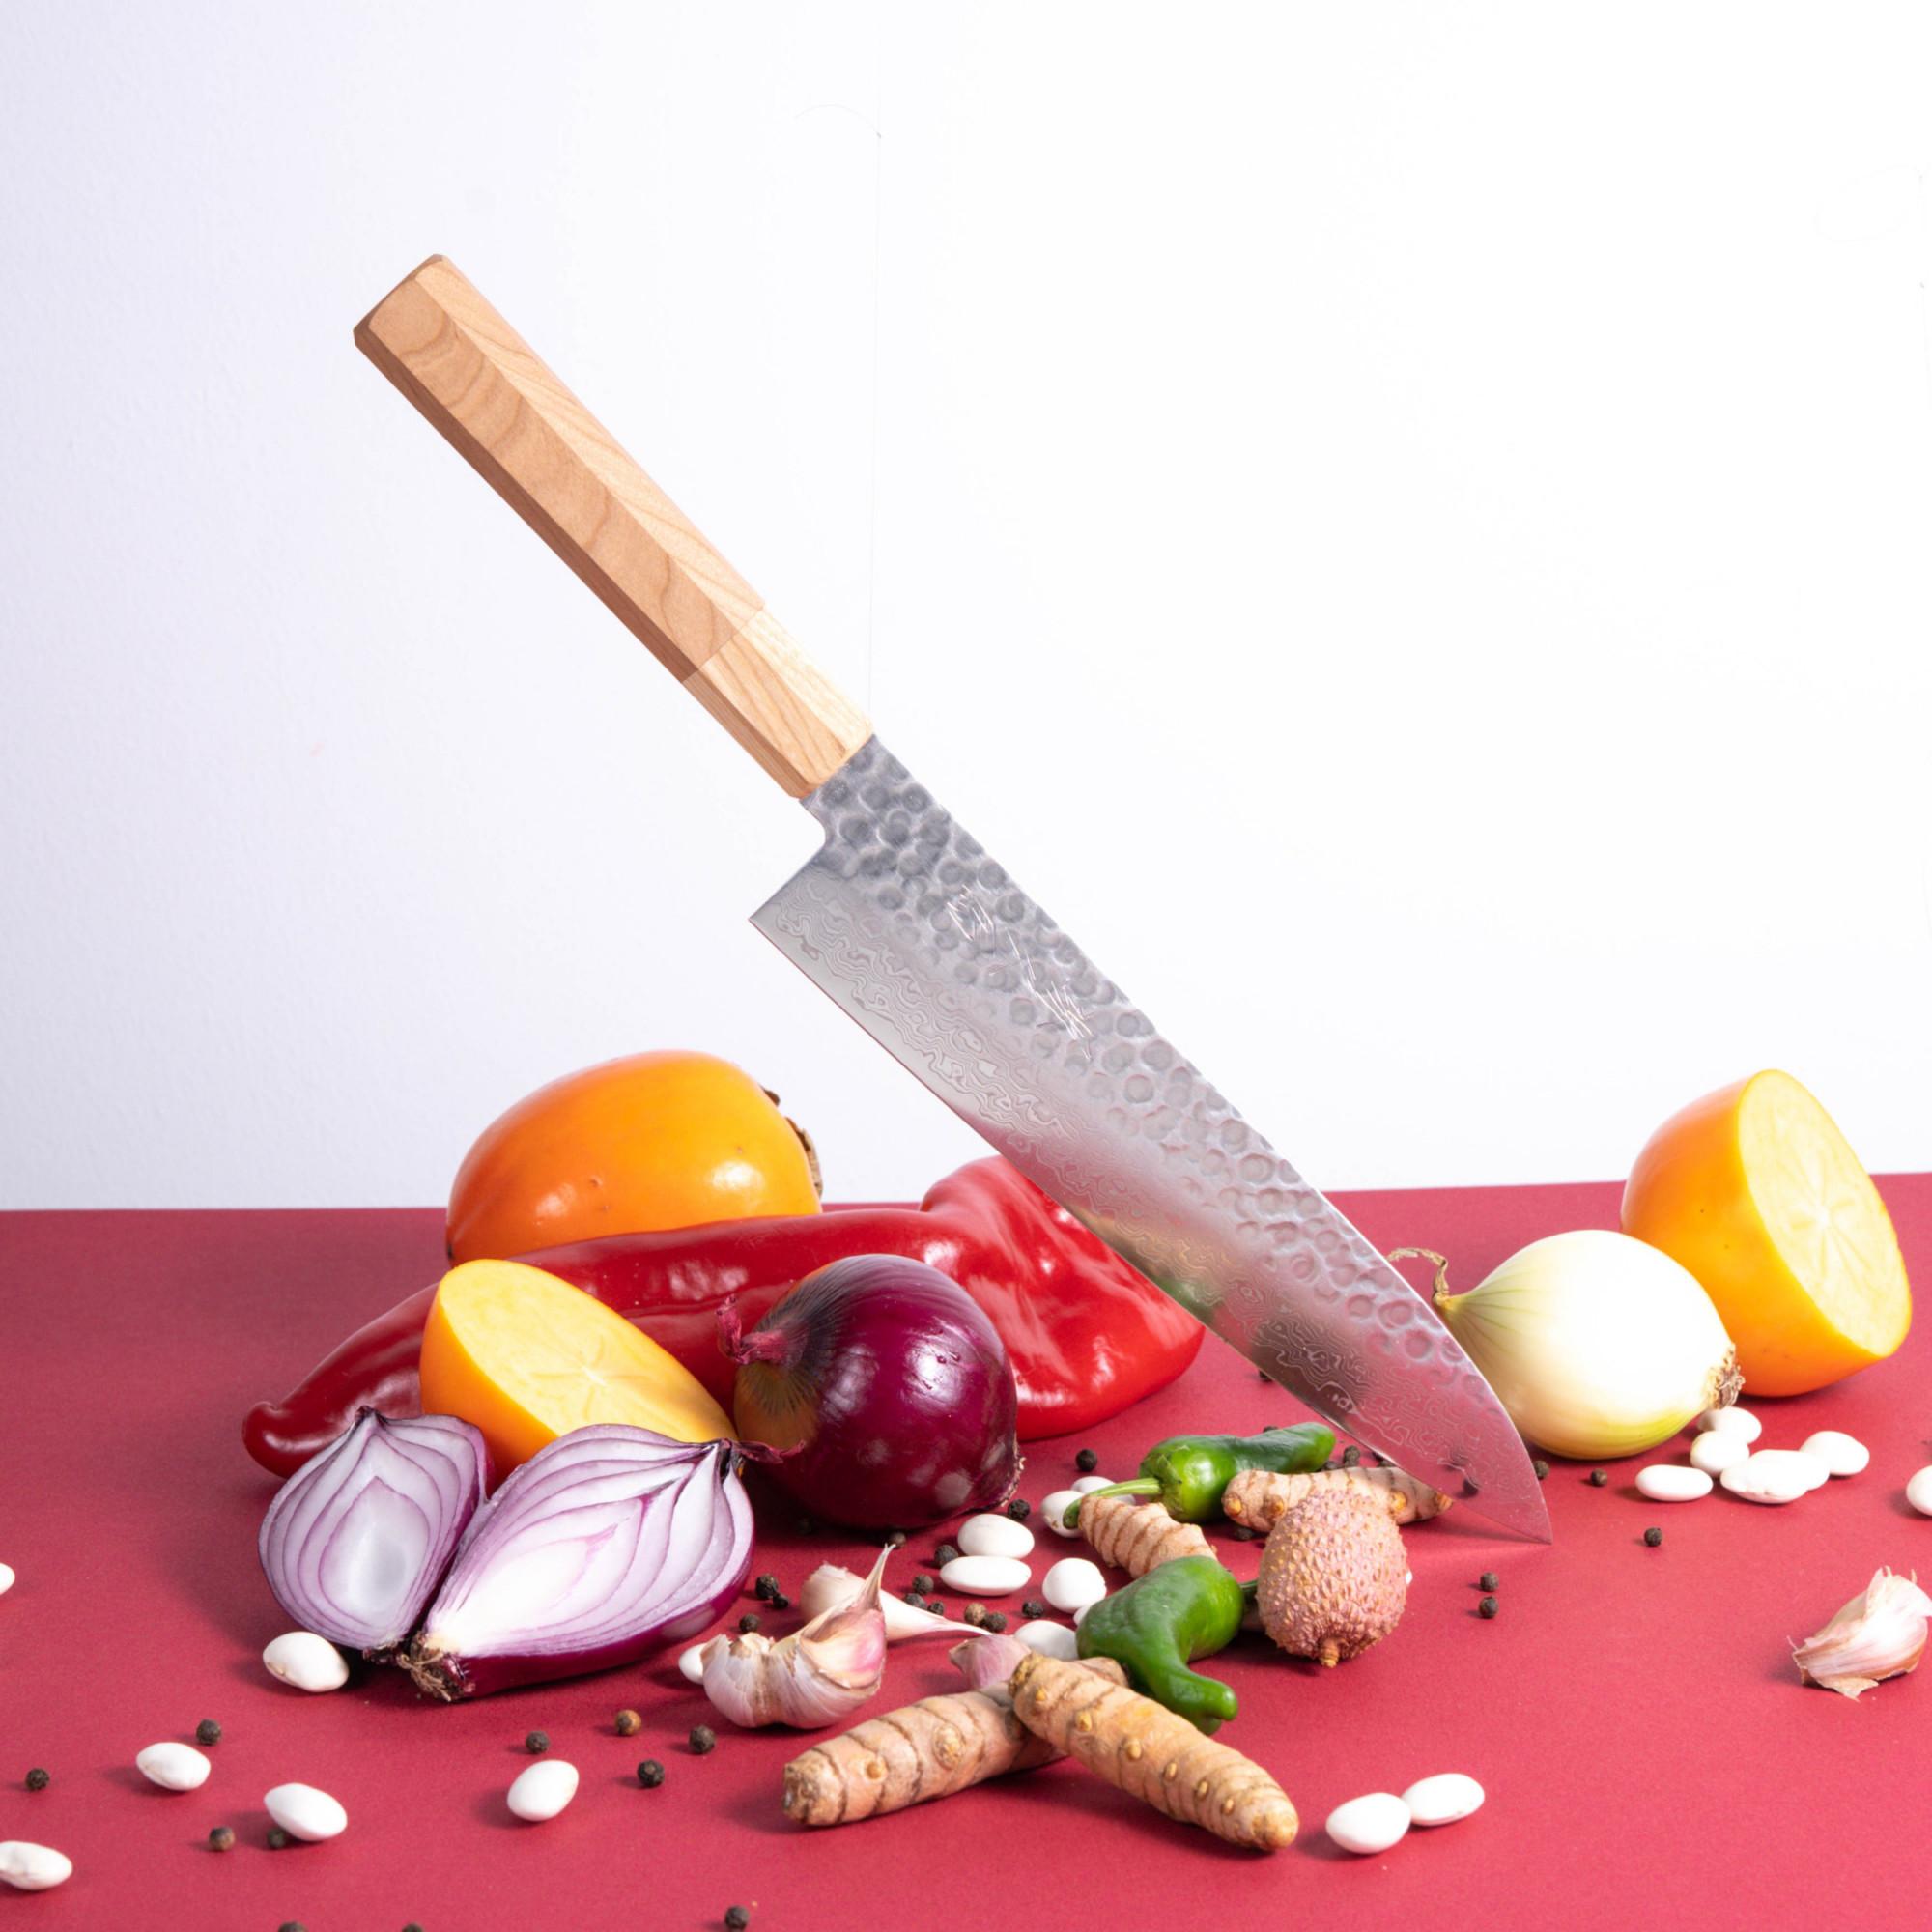 sakai kyuba classic cherry gyuto chefs knife japanese quality knives